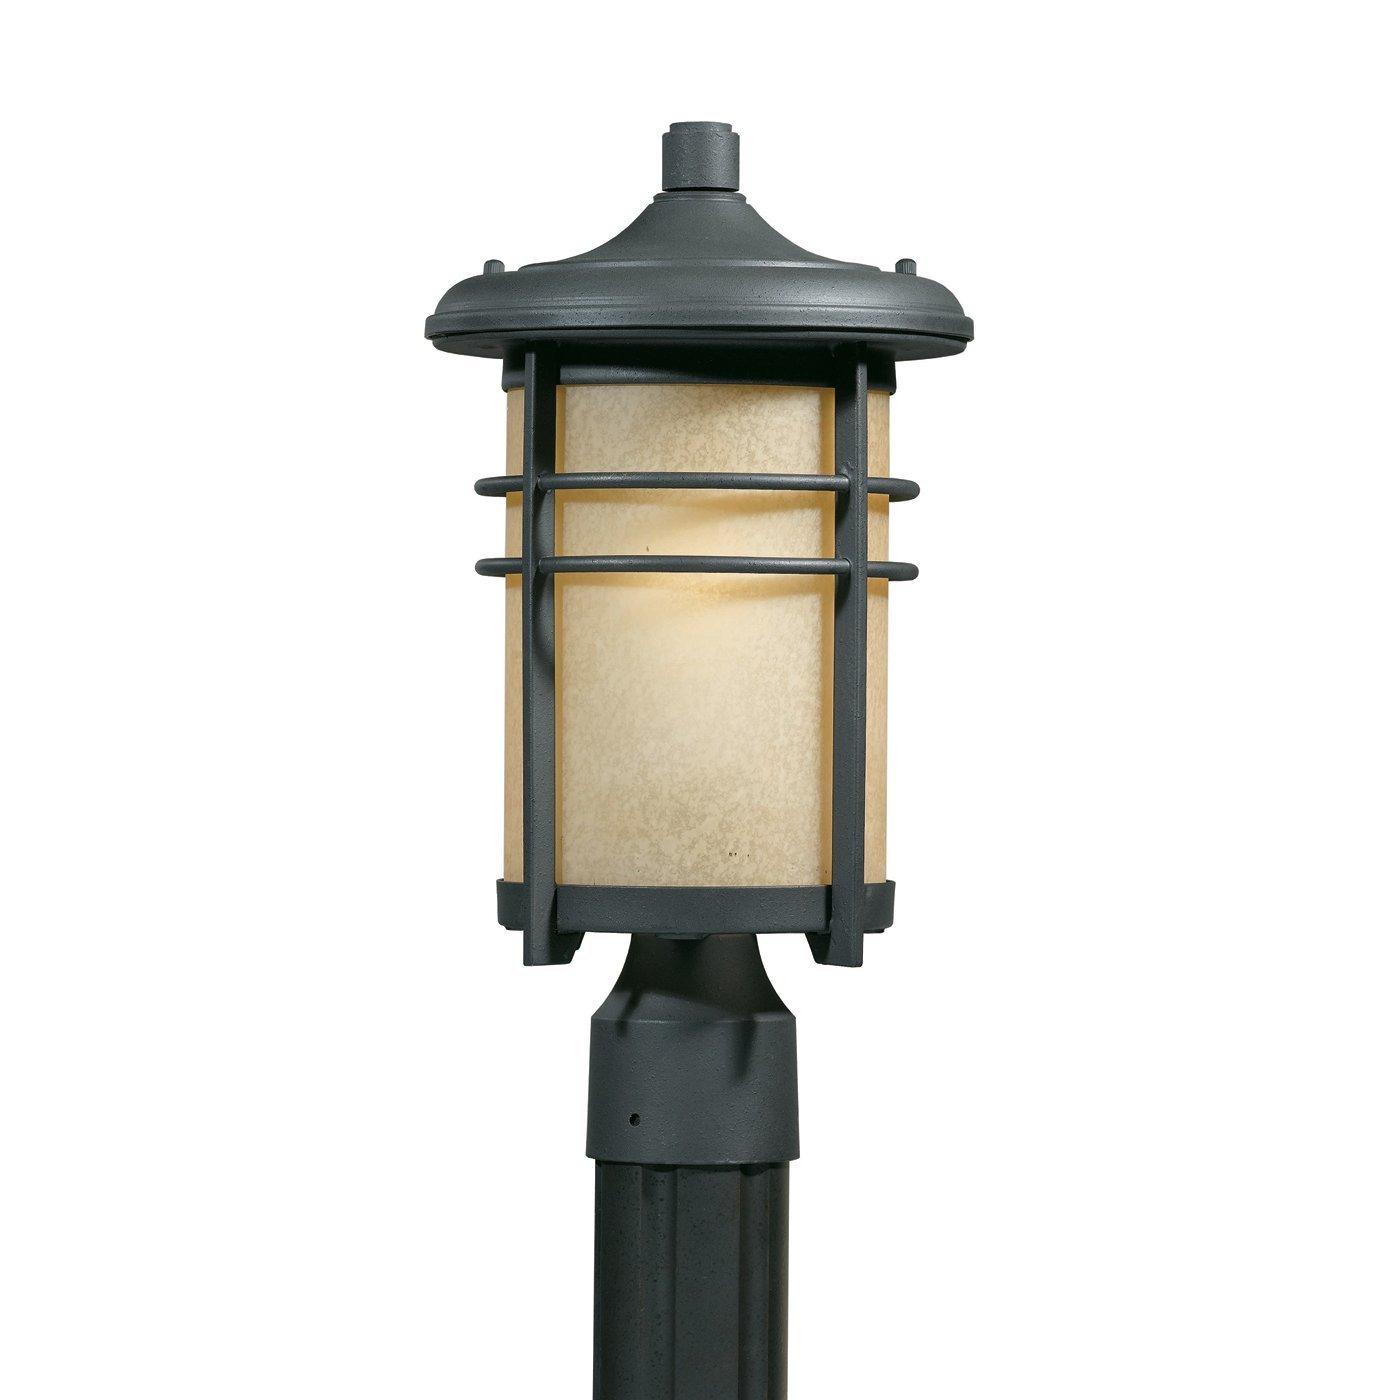 Triarch 78155-10 Fluorescent Head Post Mount Light, Blacksmith by Triarch International